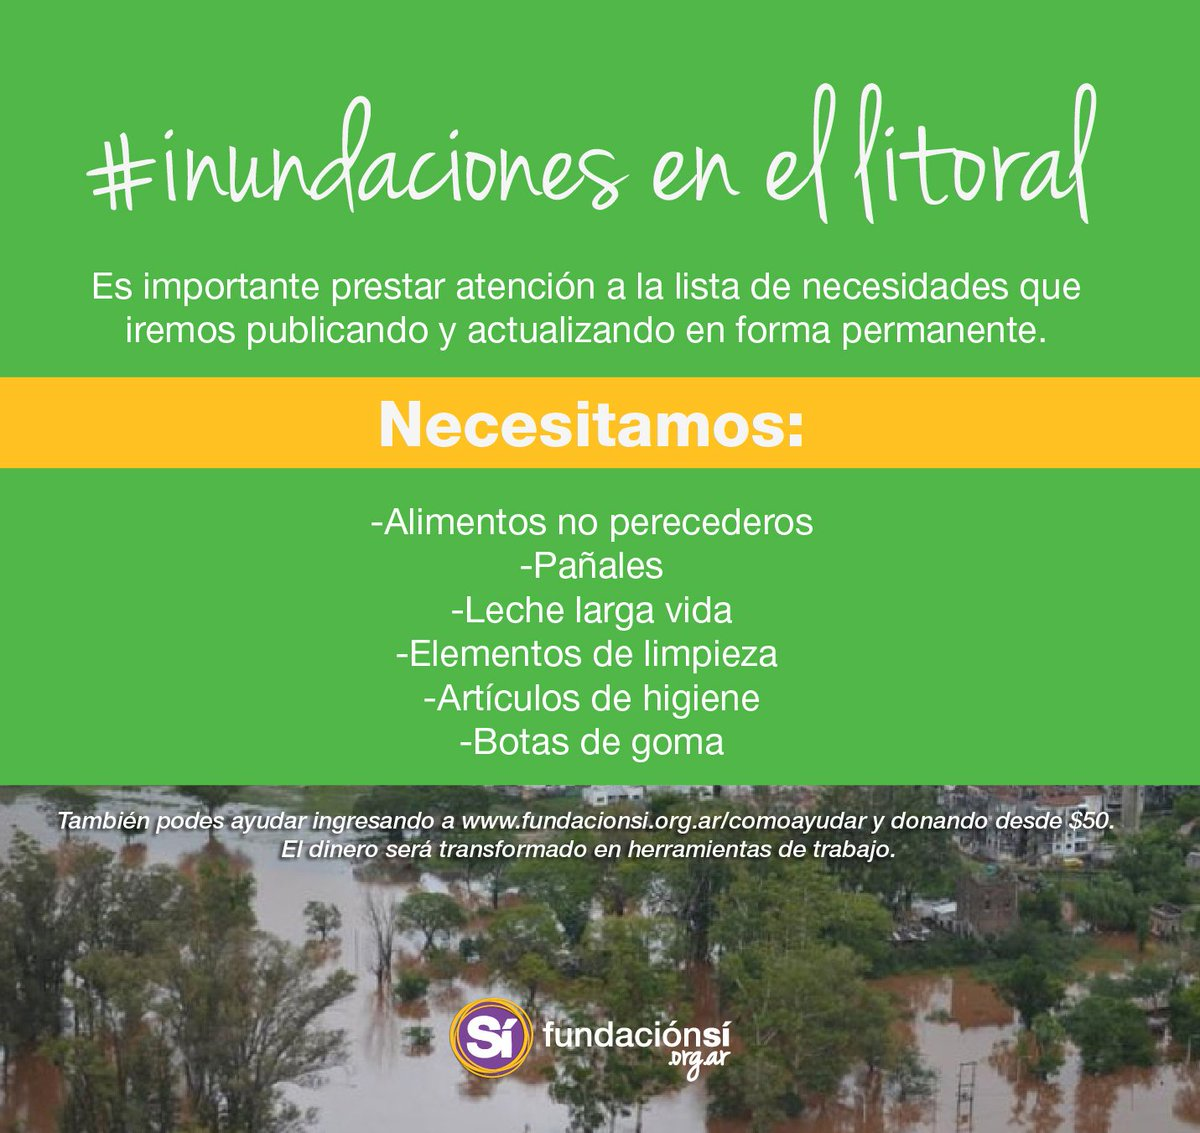 #Inundaciones https://t.co/RGNyNVN3us